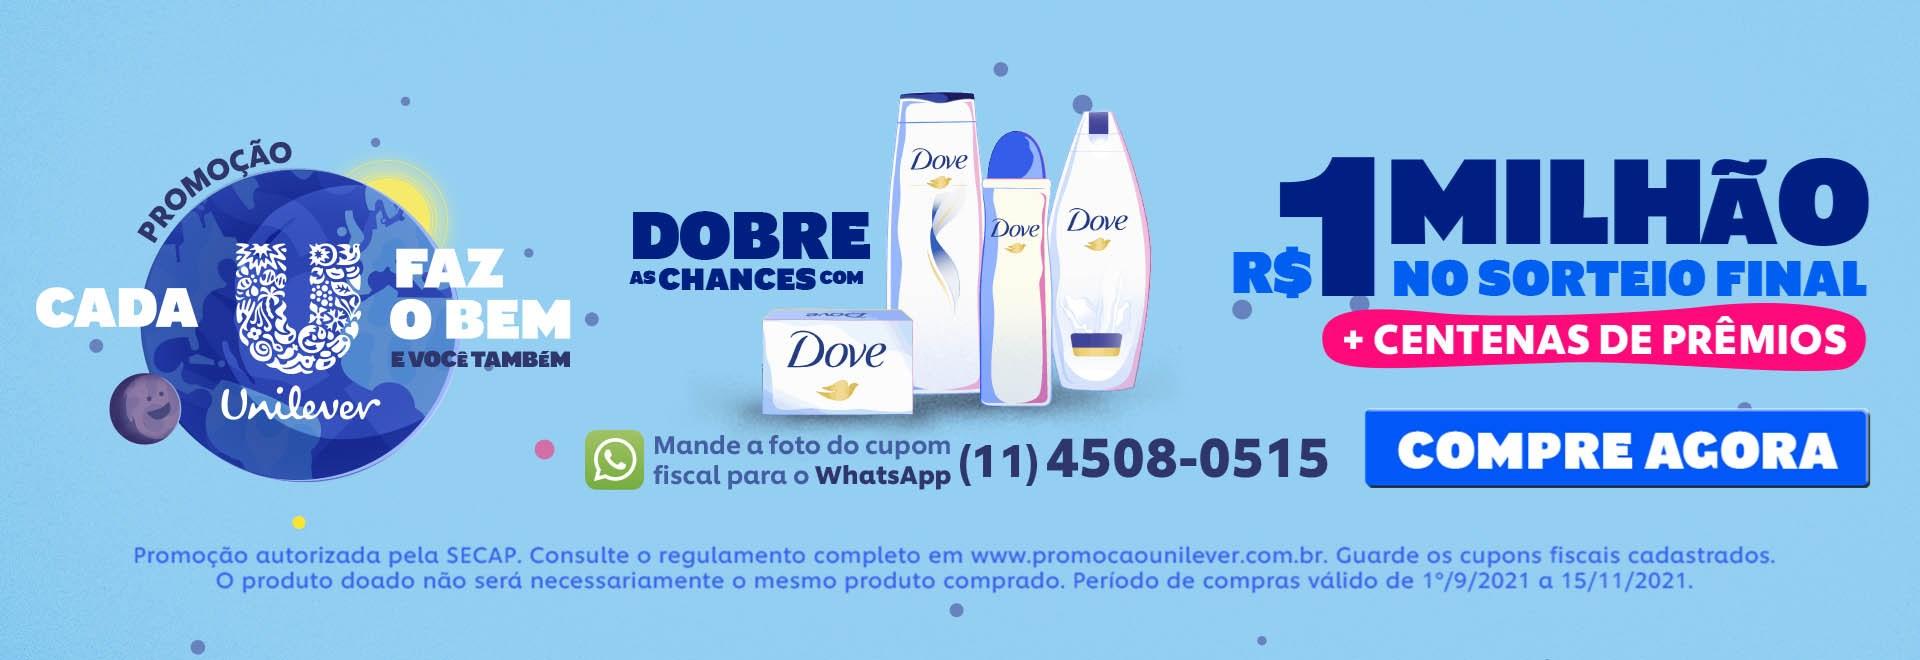 Campanha Unilever